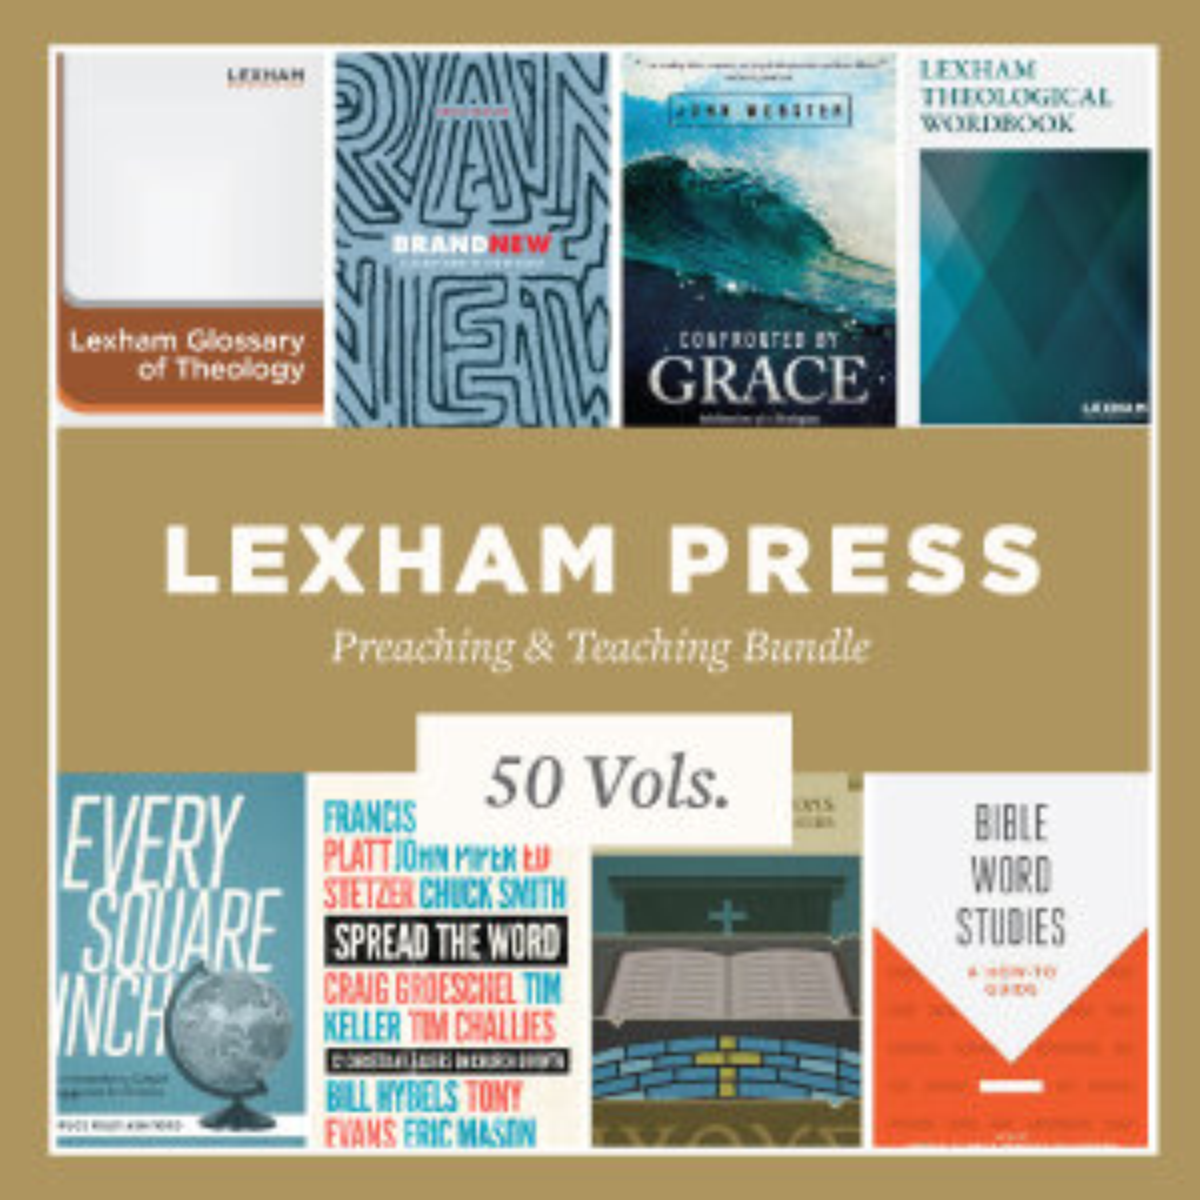 Lexham Press Preaching & Teaching Bundle (50 vols.)